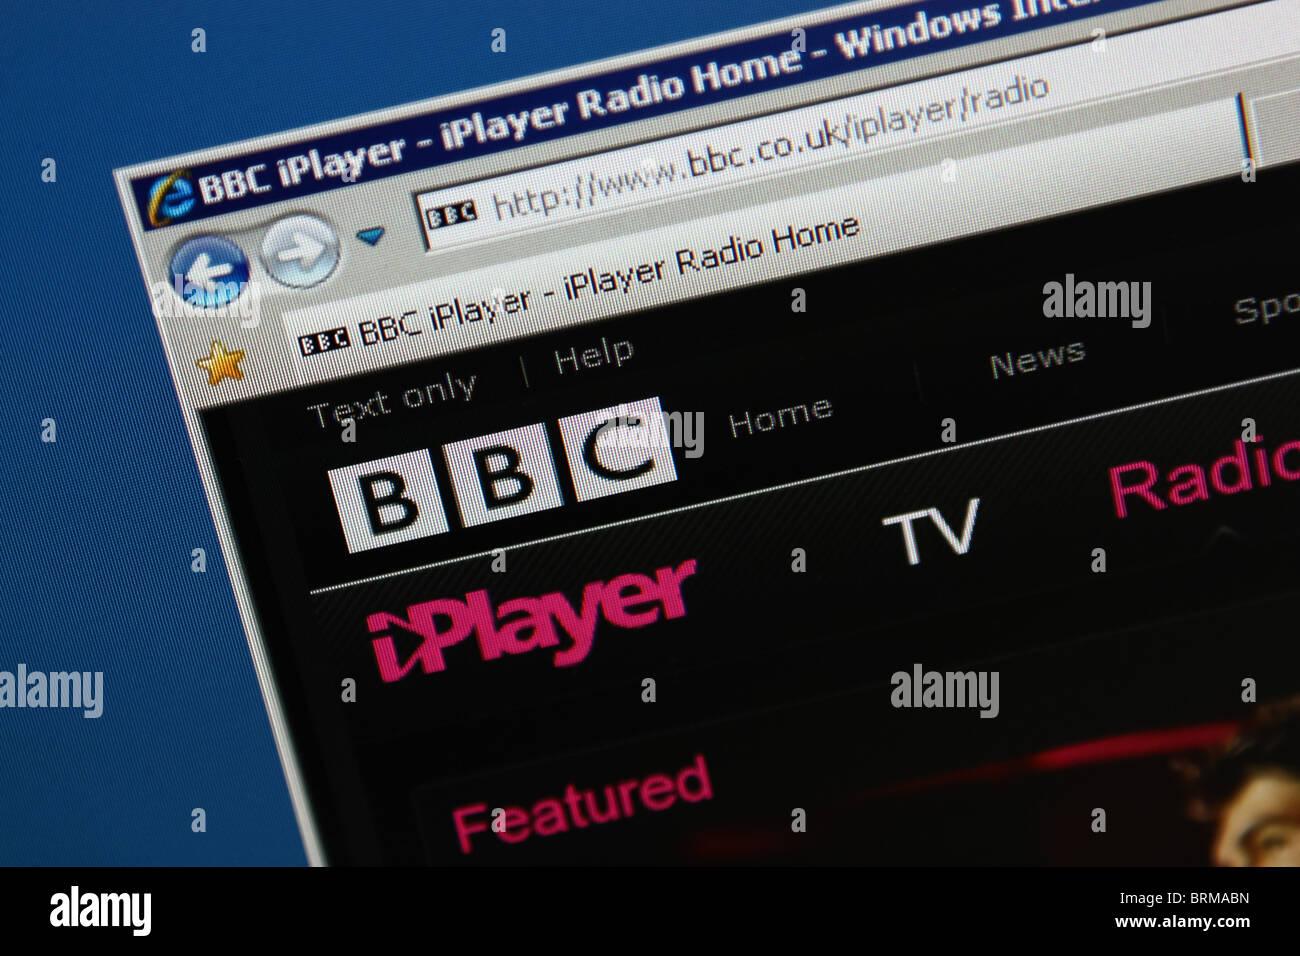 bbc iplayer online website screenshot - Stock Image